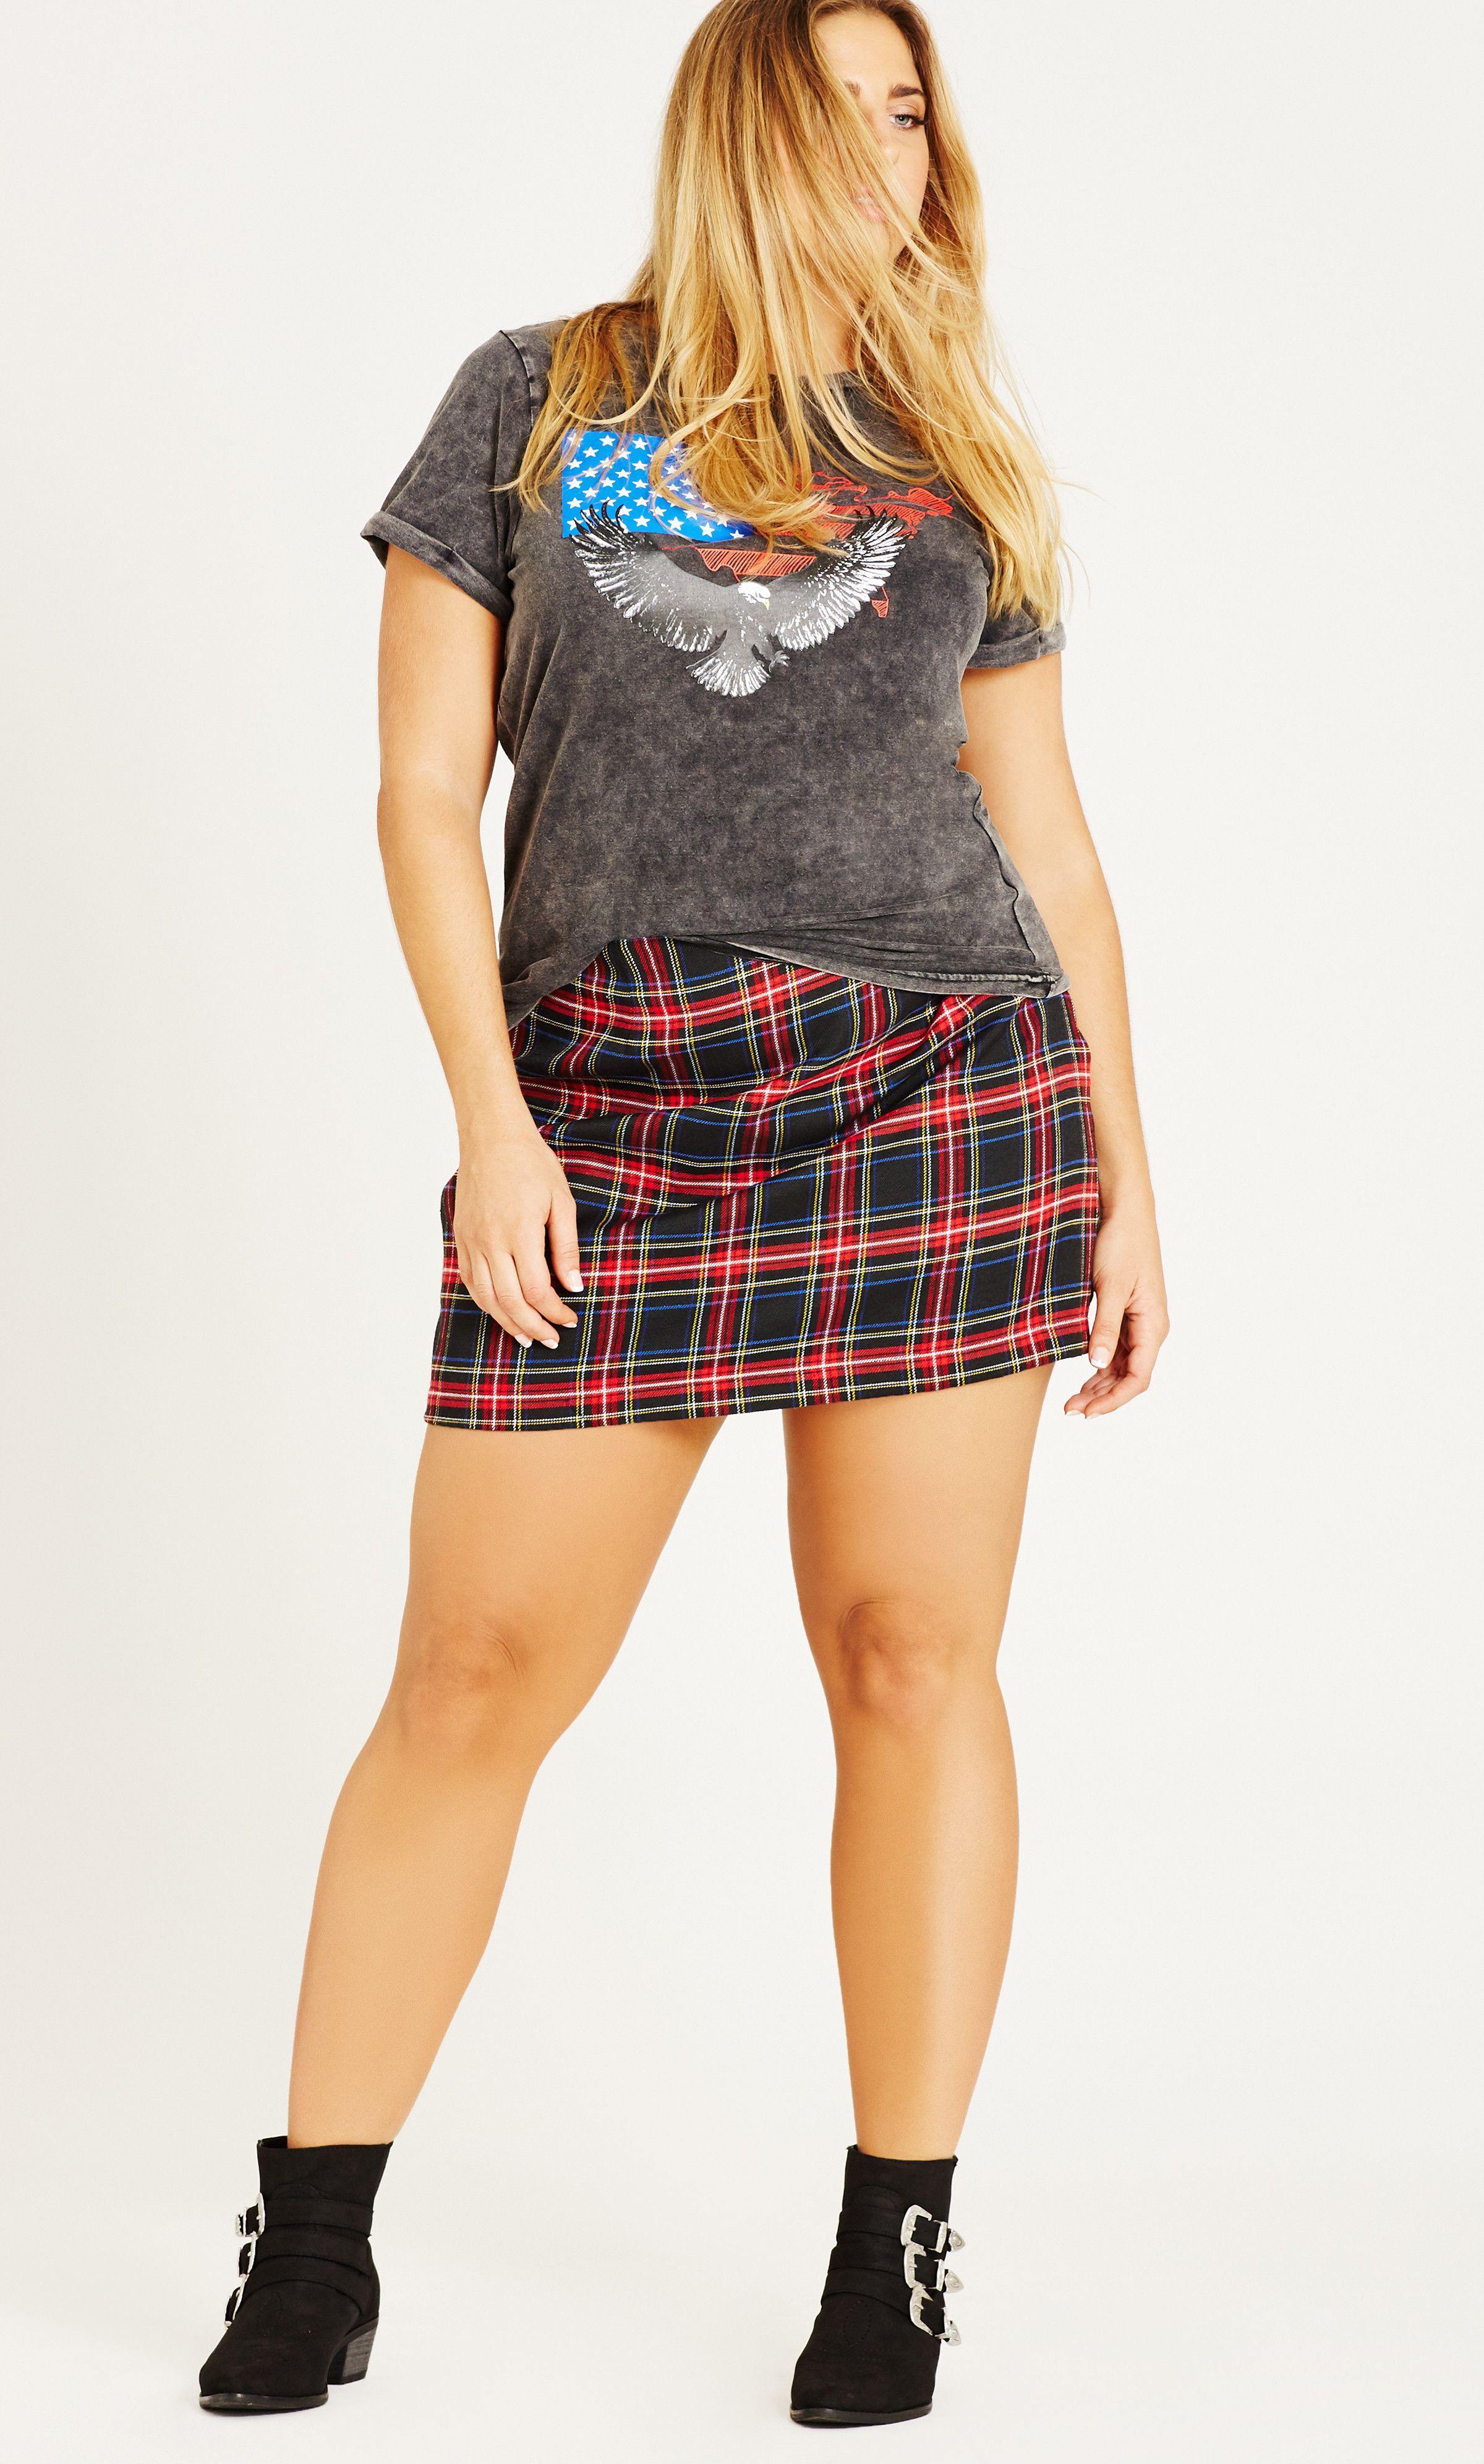 ef8617d391 Shop Women's Plus Size 90's Girl Skirt - Black - Clearance | City Chic USA